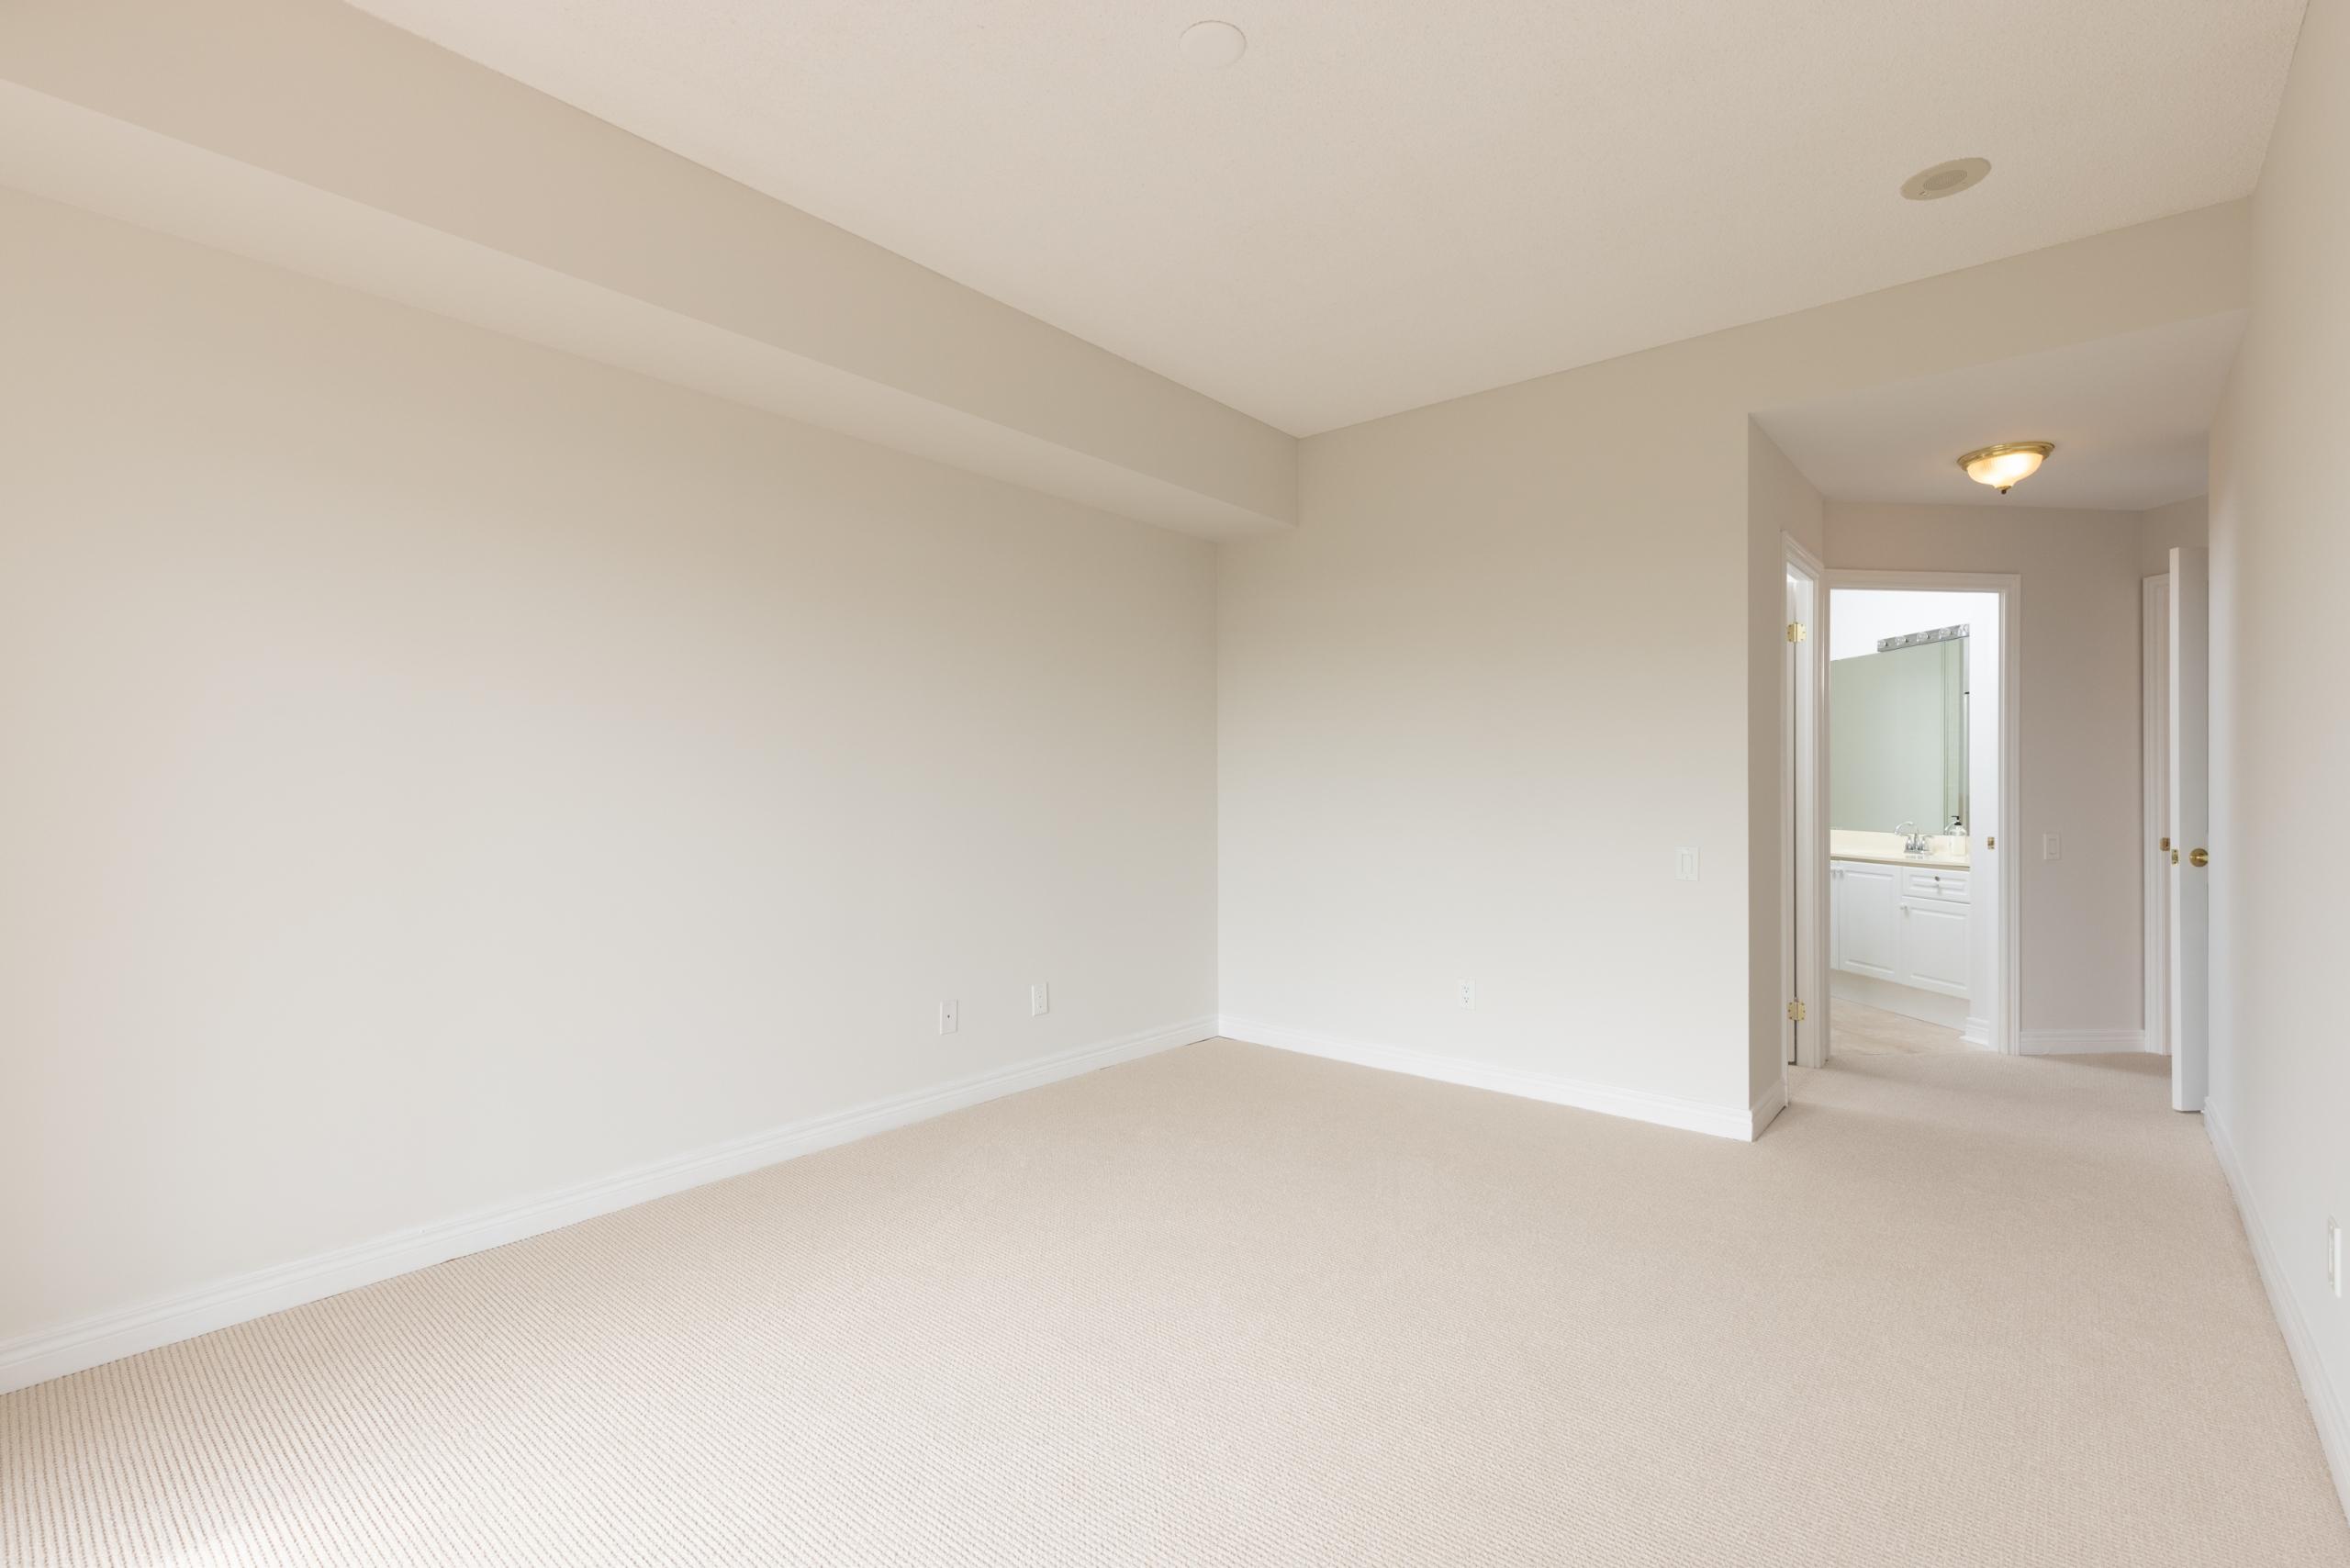 Bedroom featured at 508-40 Old Mill Road, Oakville at Alex Irish & Associates